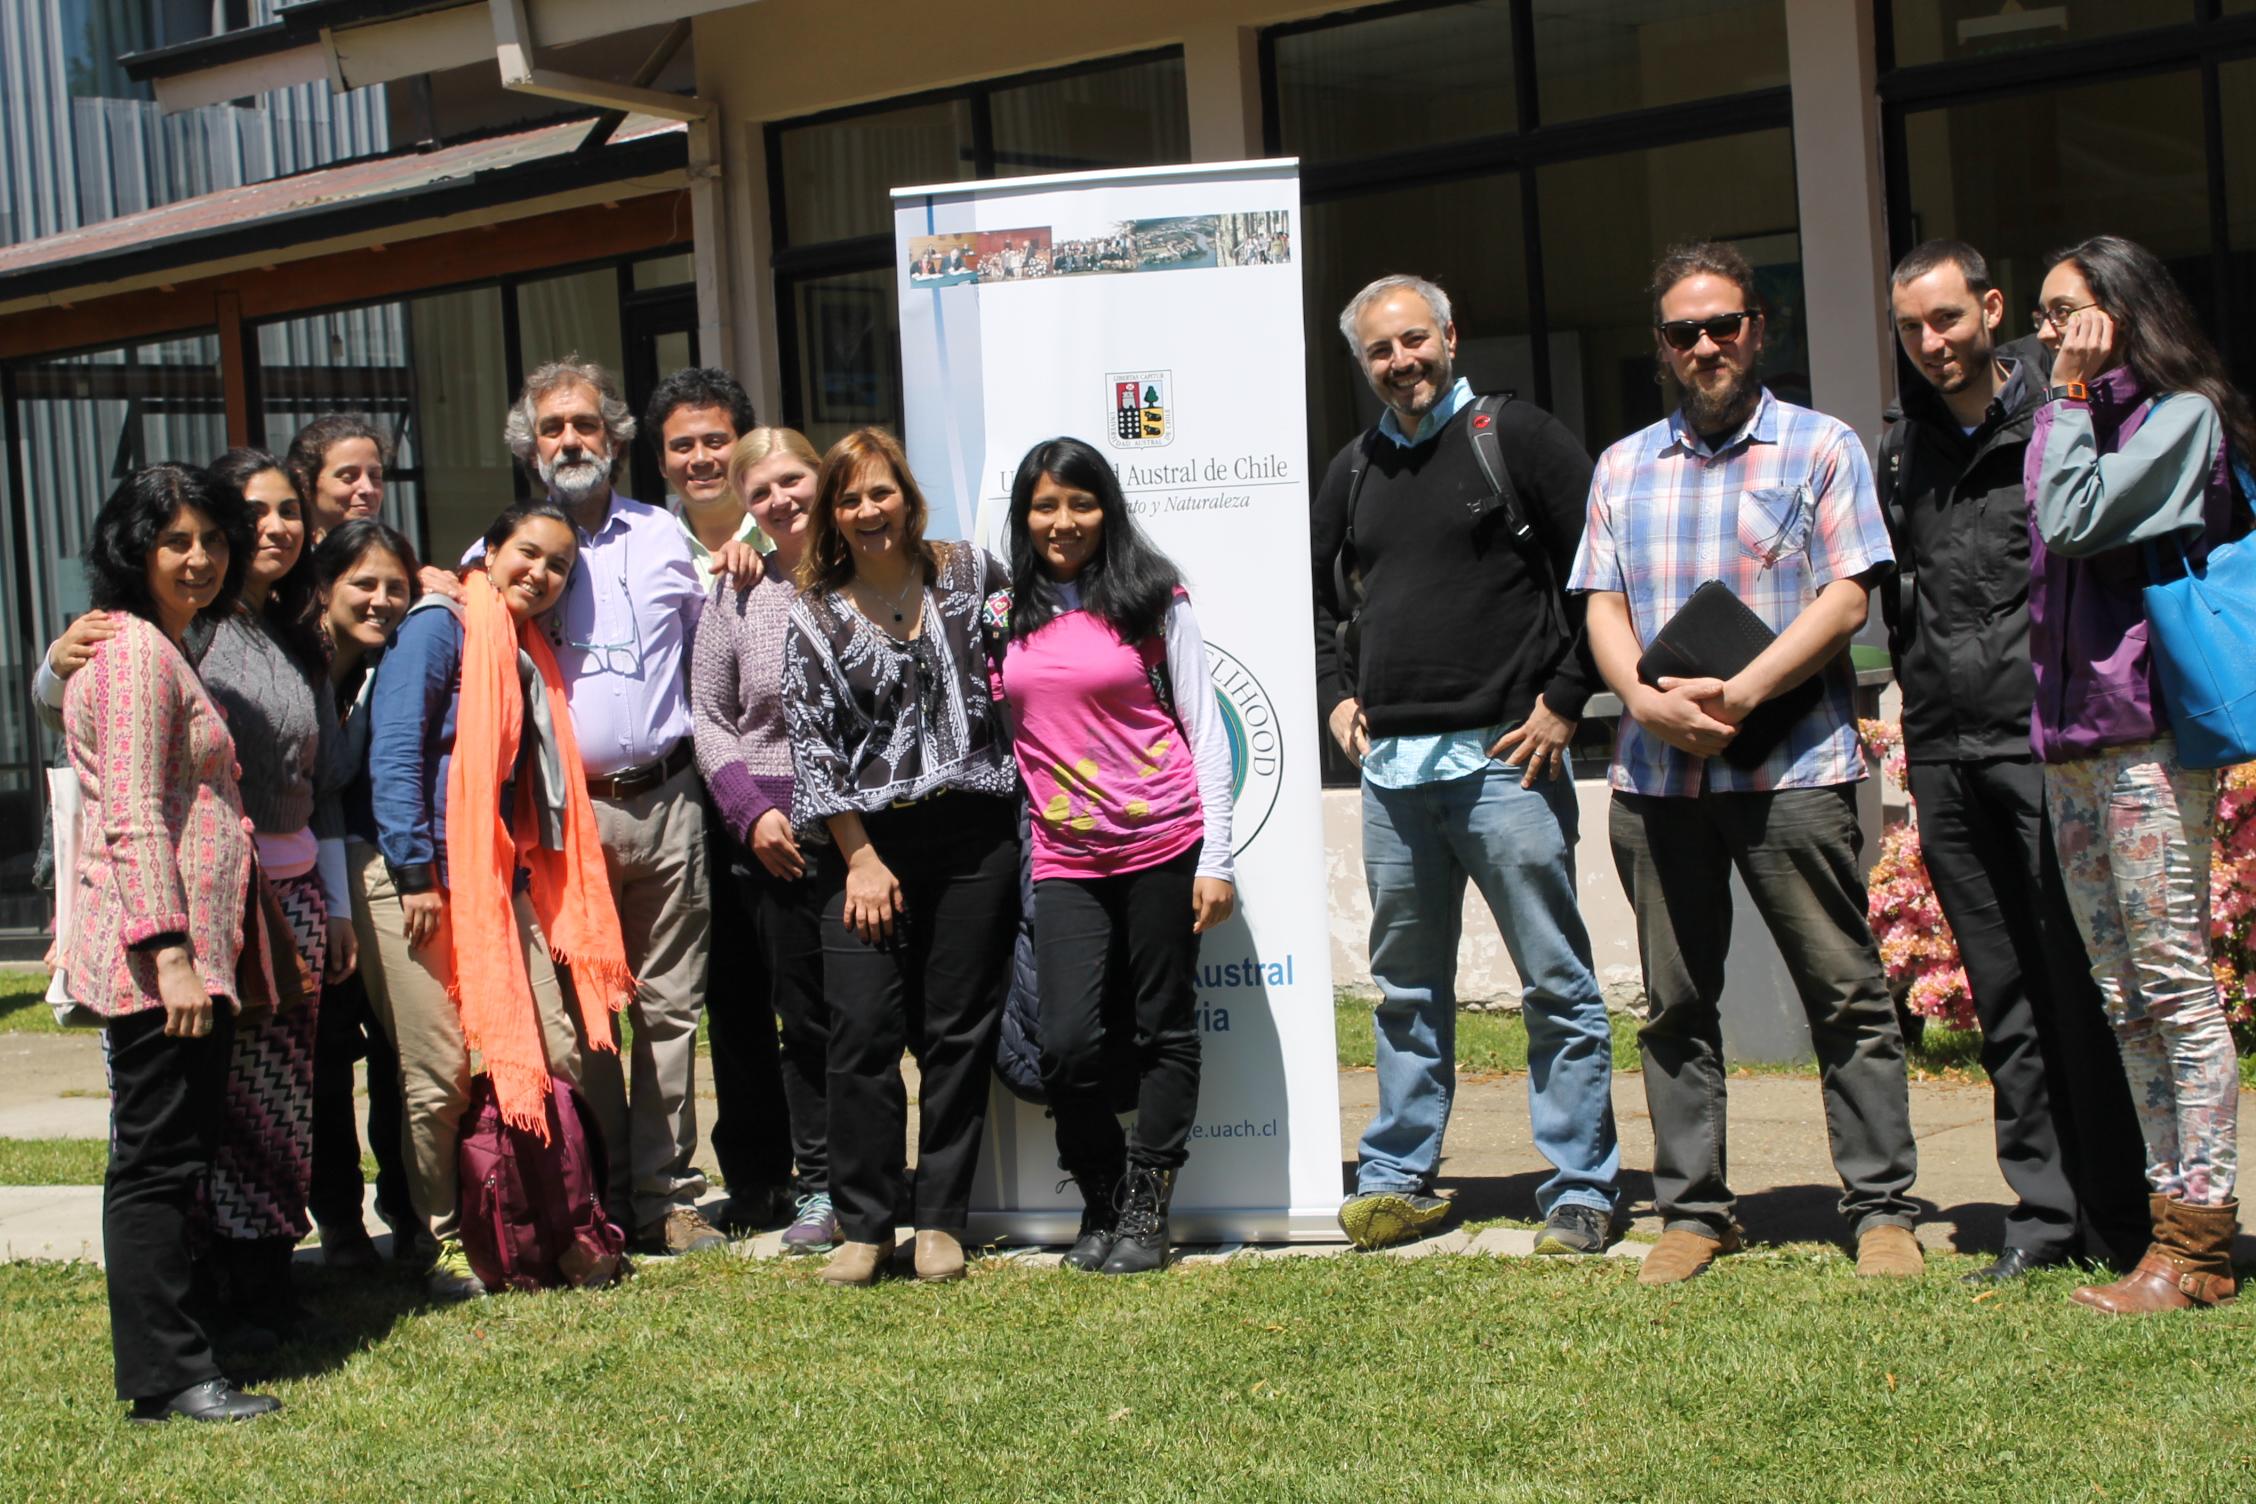 Juan Pablo Orrego visits the Right Livelihood College in Valdivia